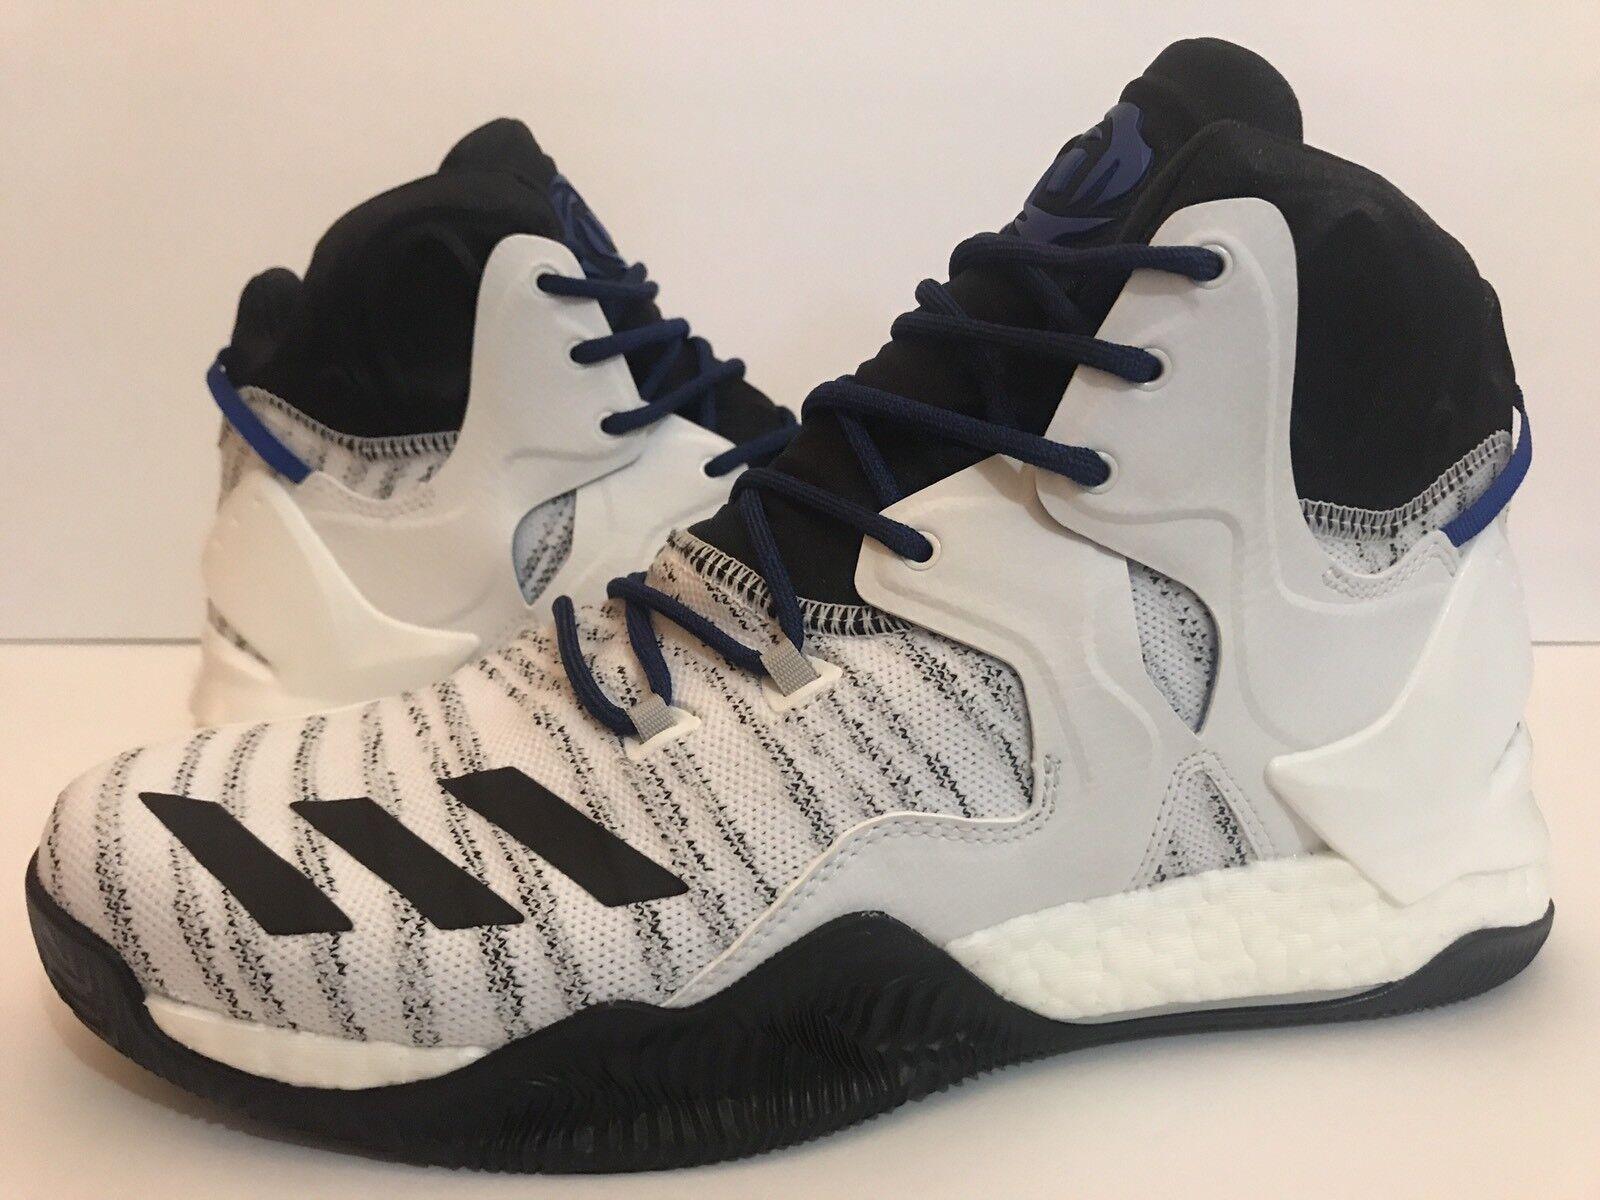 Adidas Derrick Rose Vll Boost PrimeKnit B72720 Sz 10 11